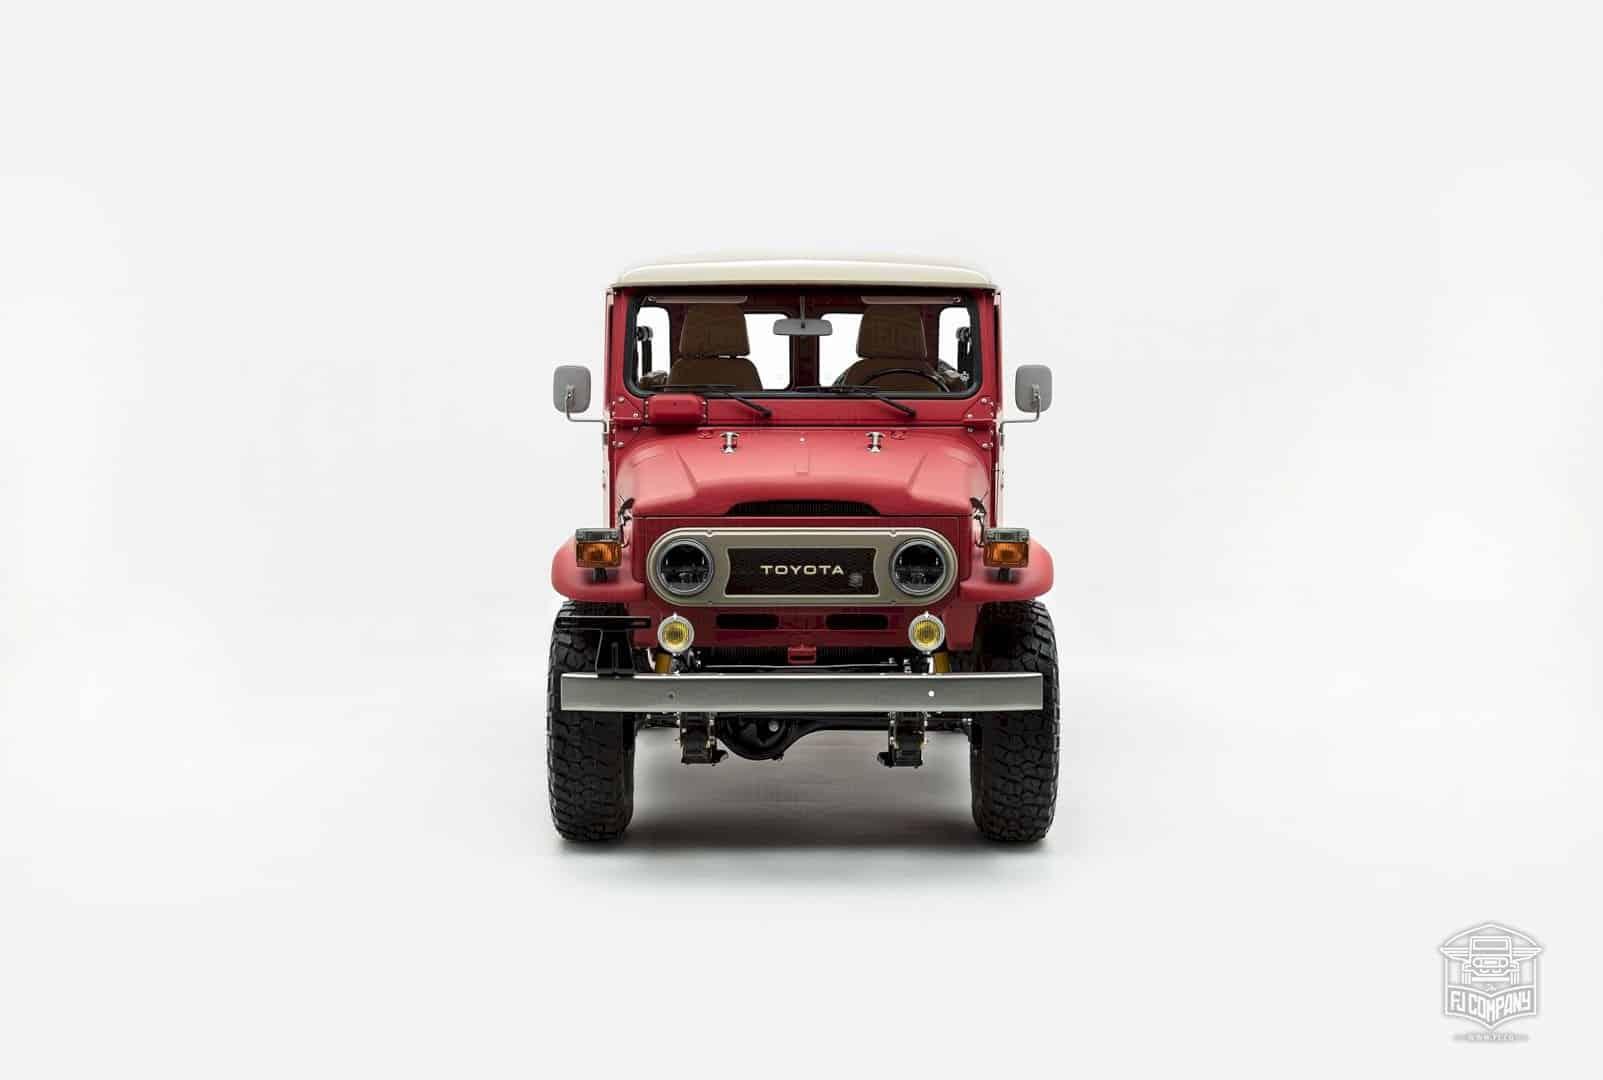 1981 Toyota Land Cruiser Fj43 5